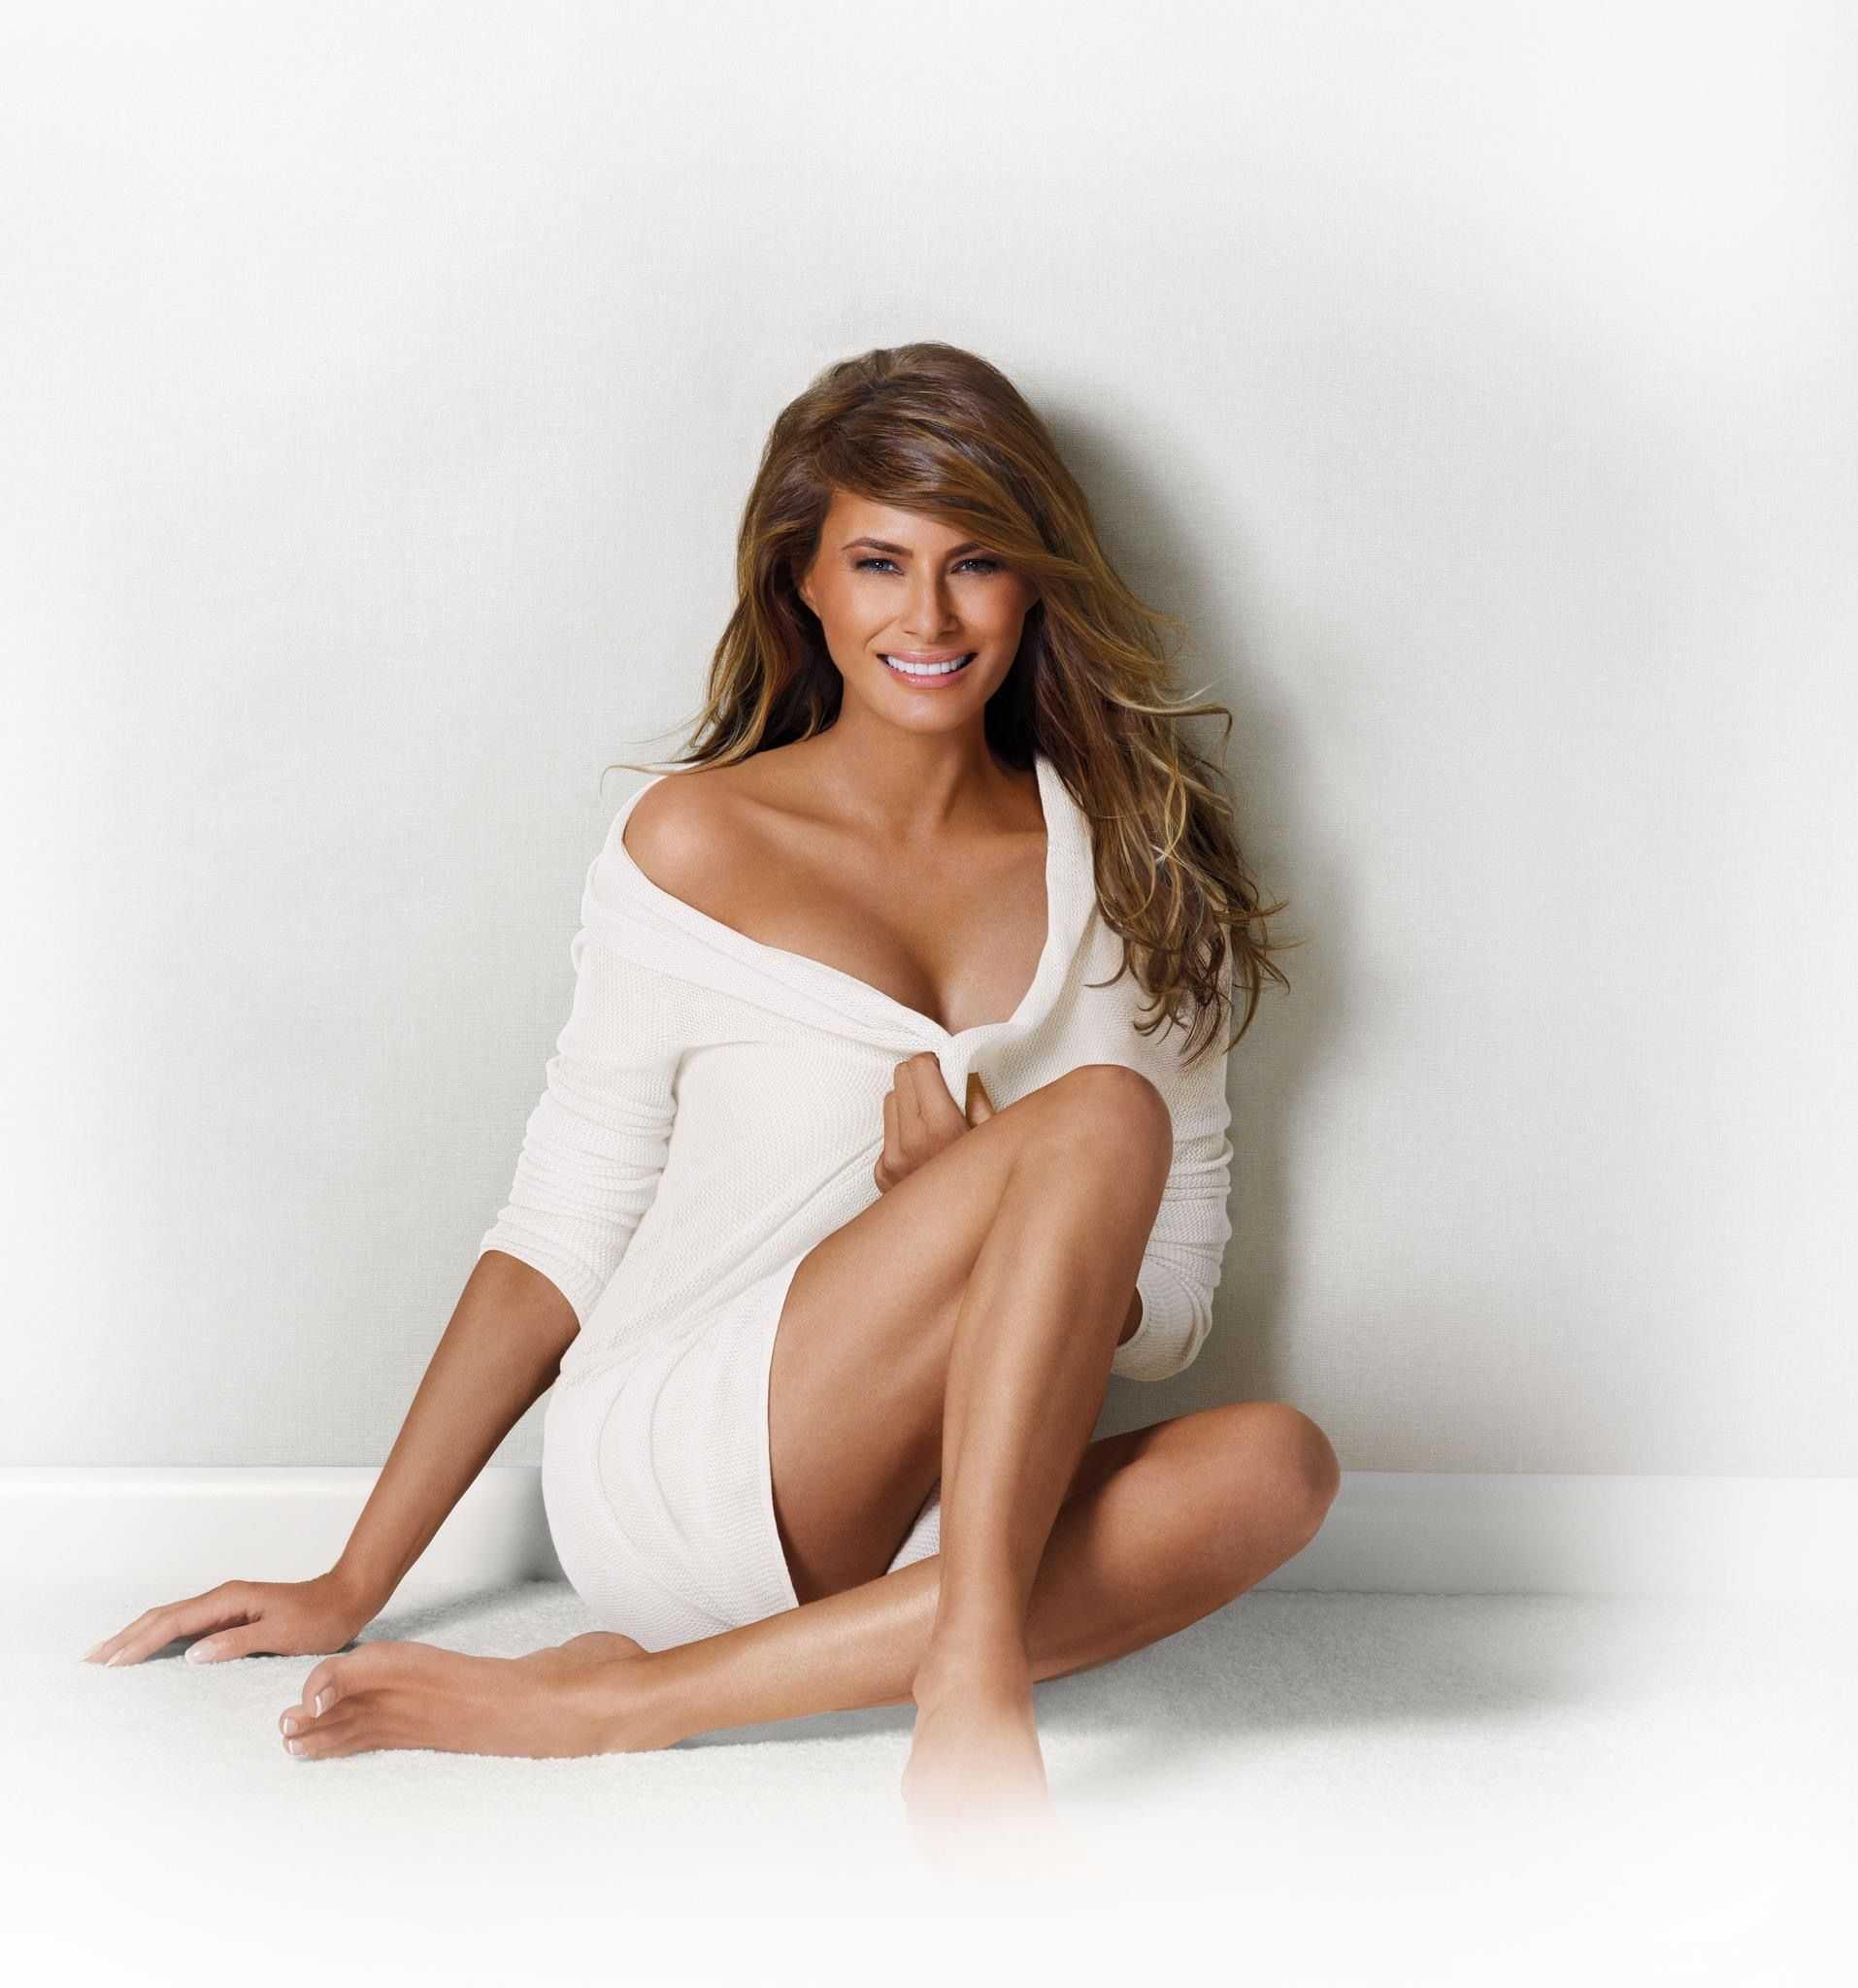 Melania Trump sexy pictures